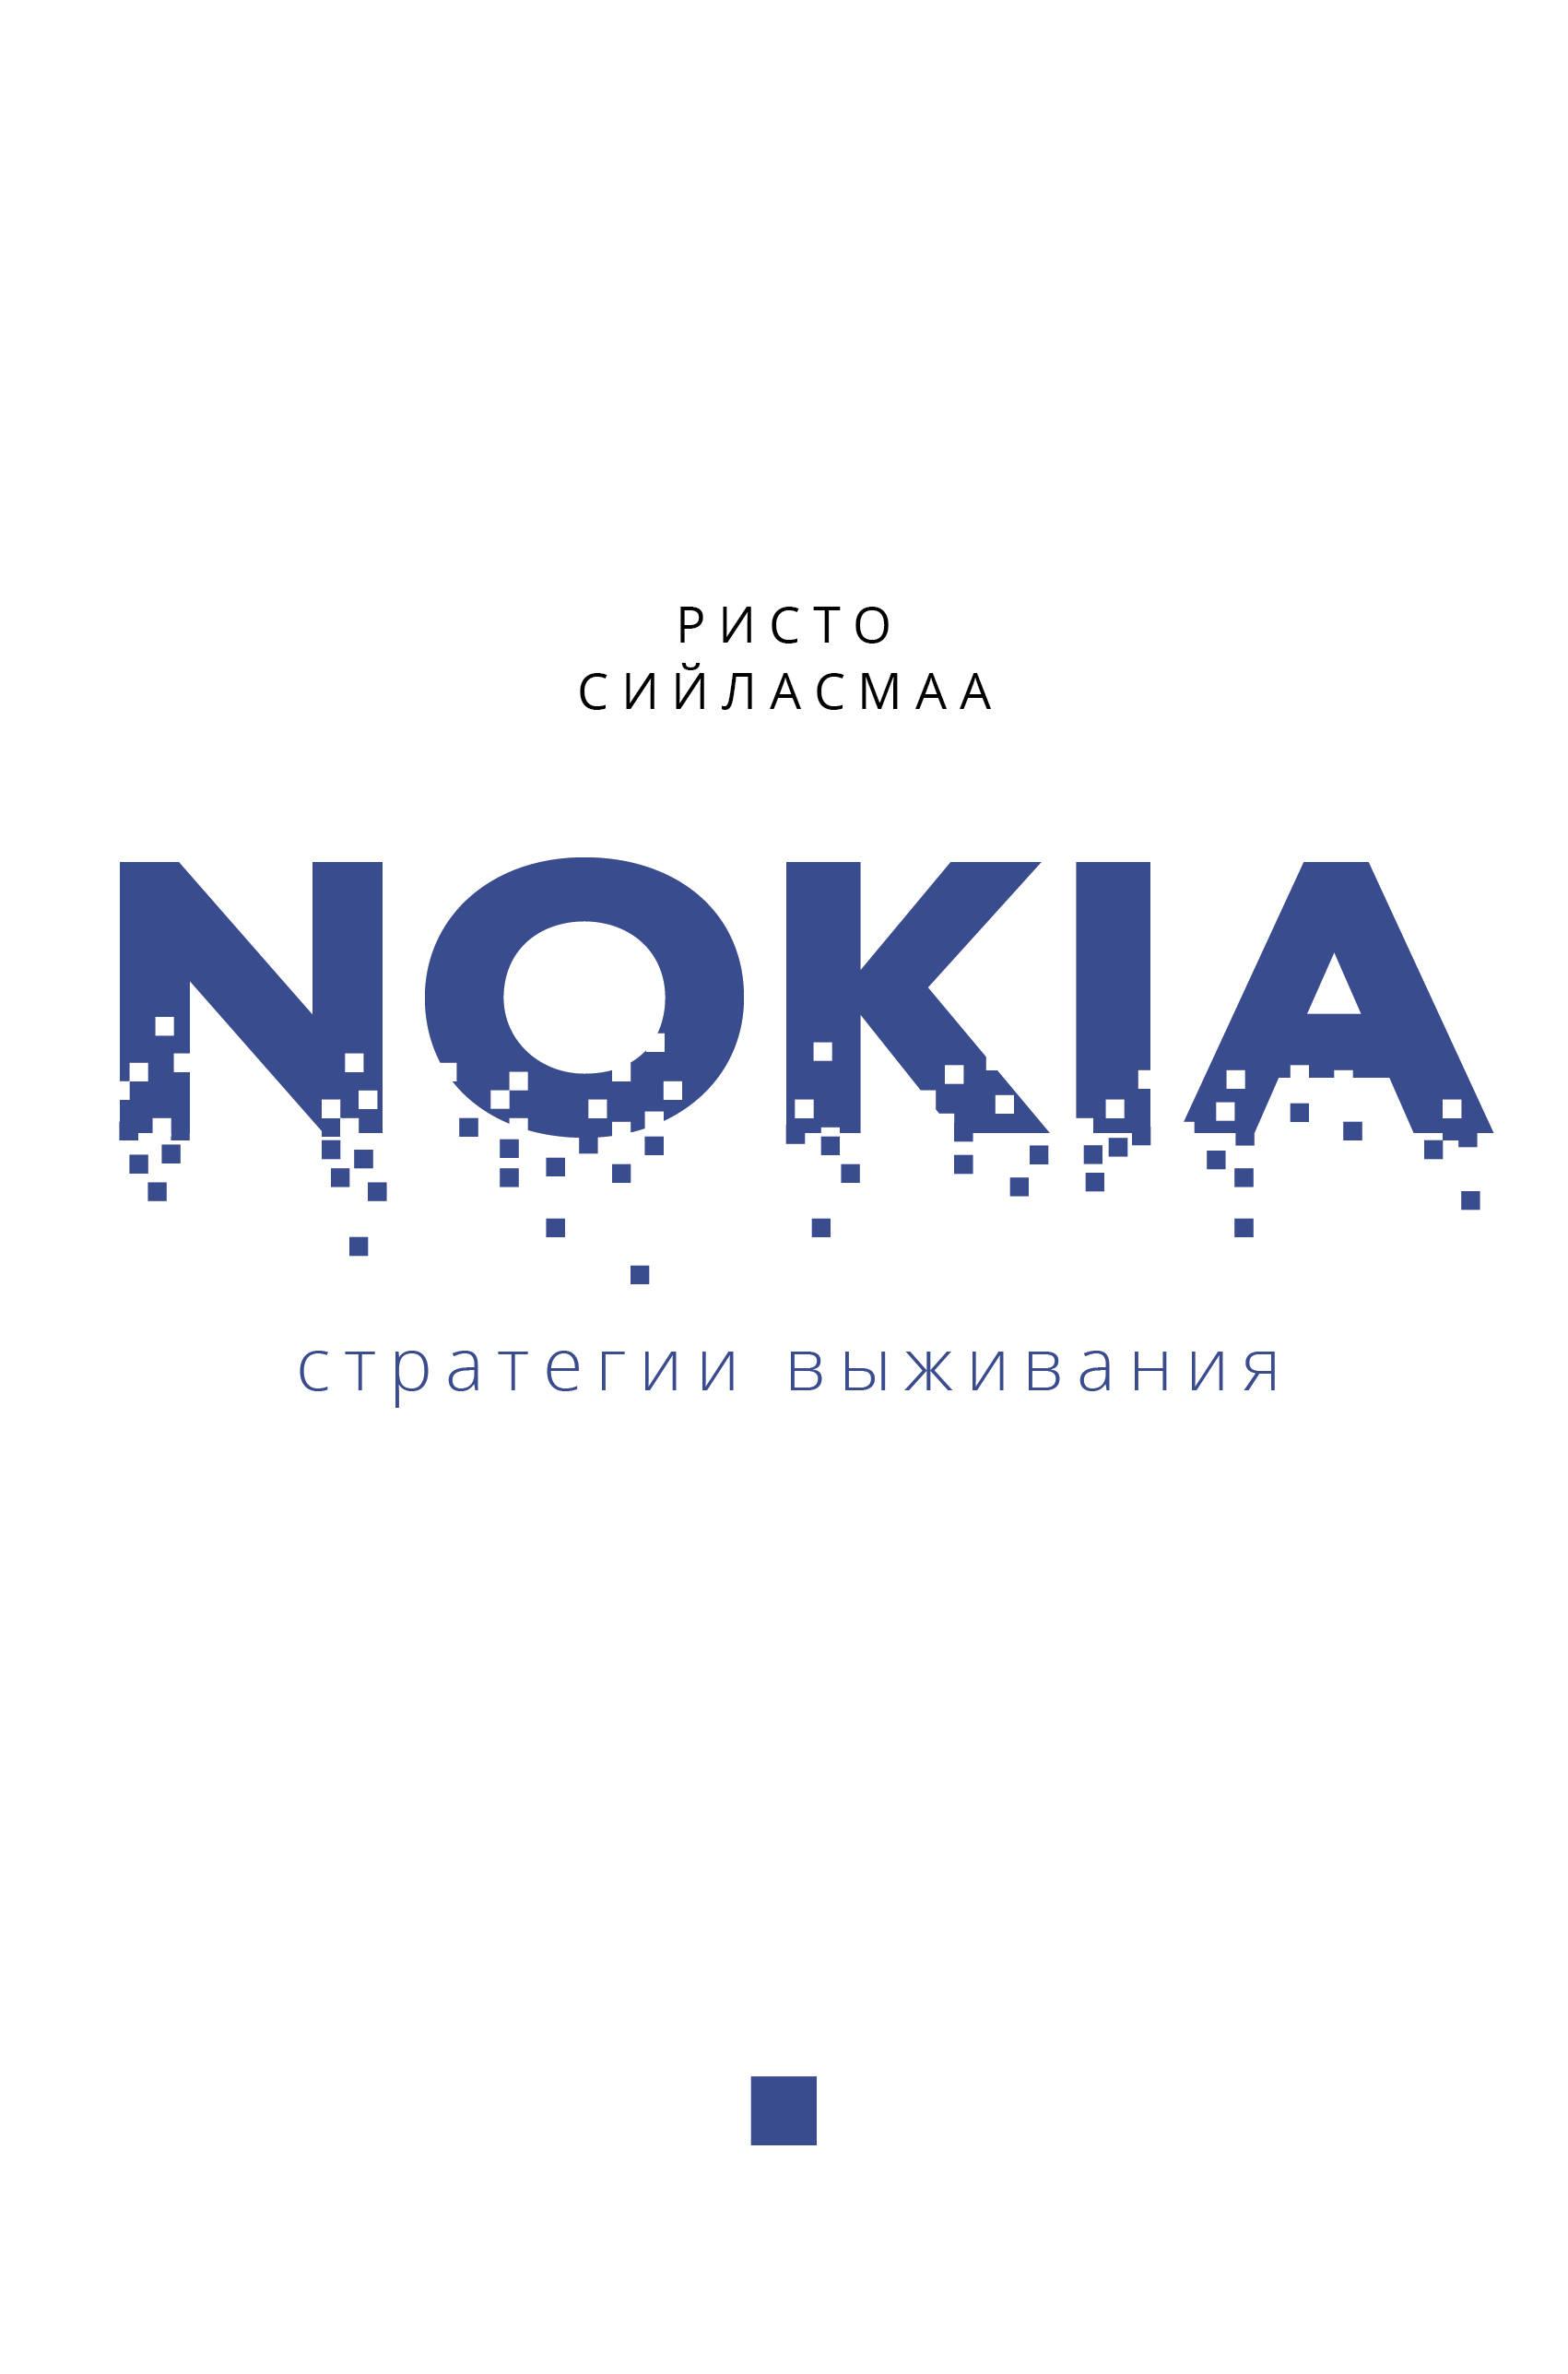 Nokia. Strategii vyzhivanija